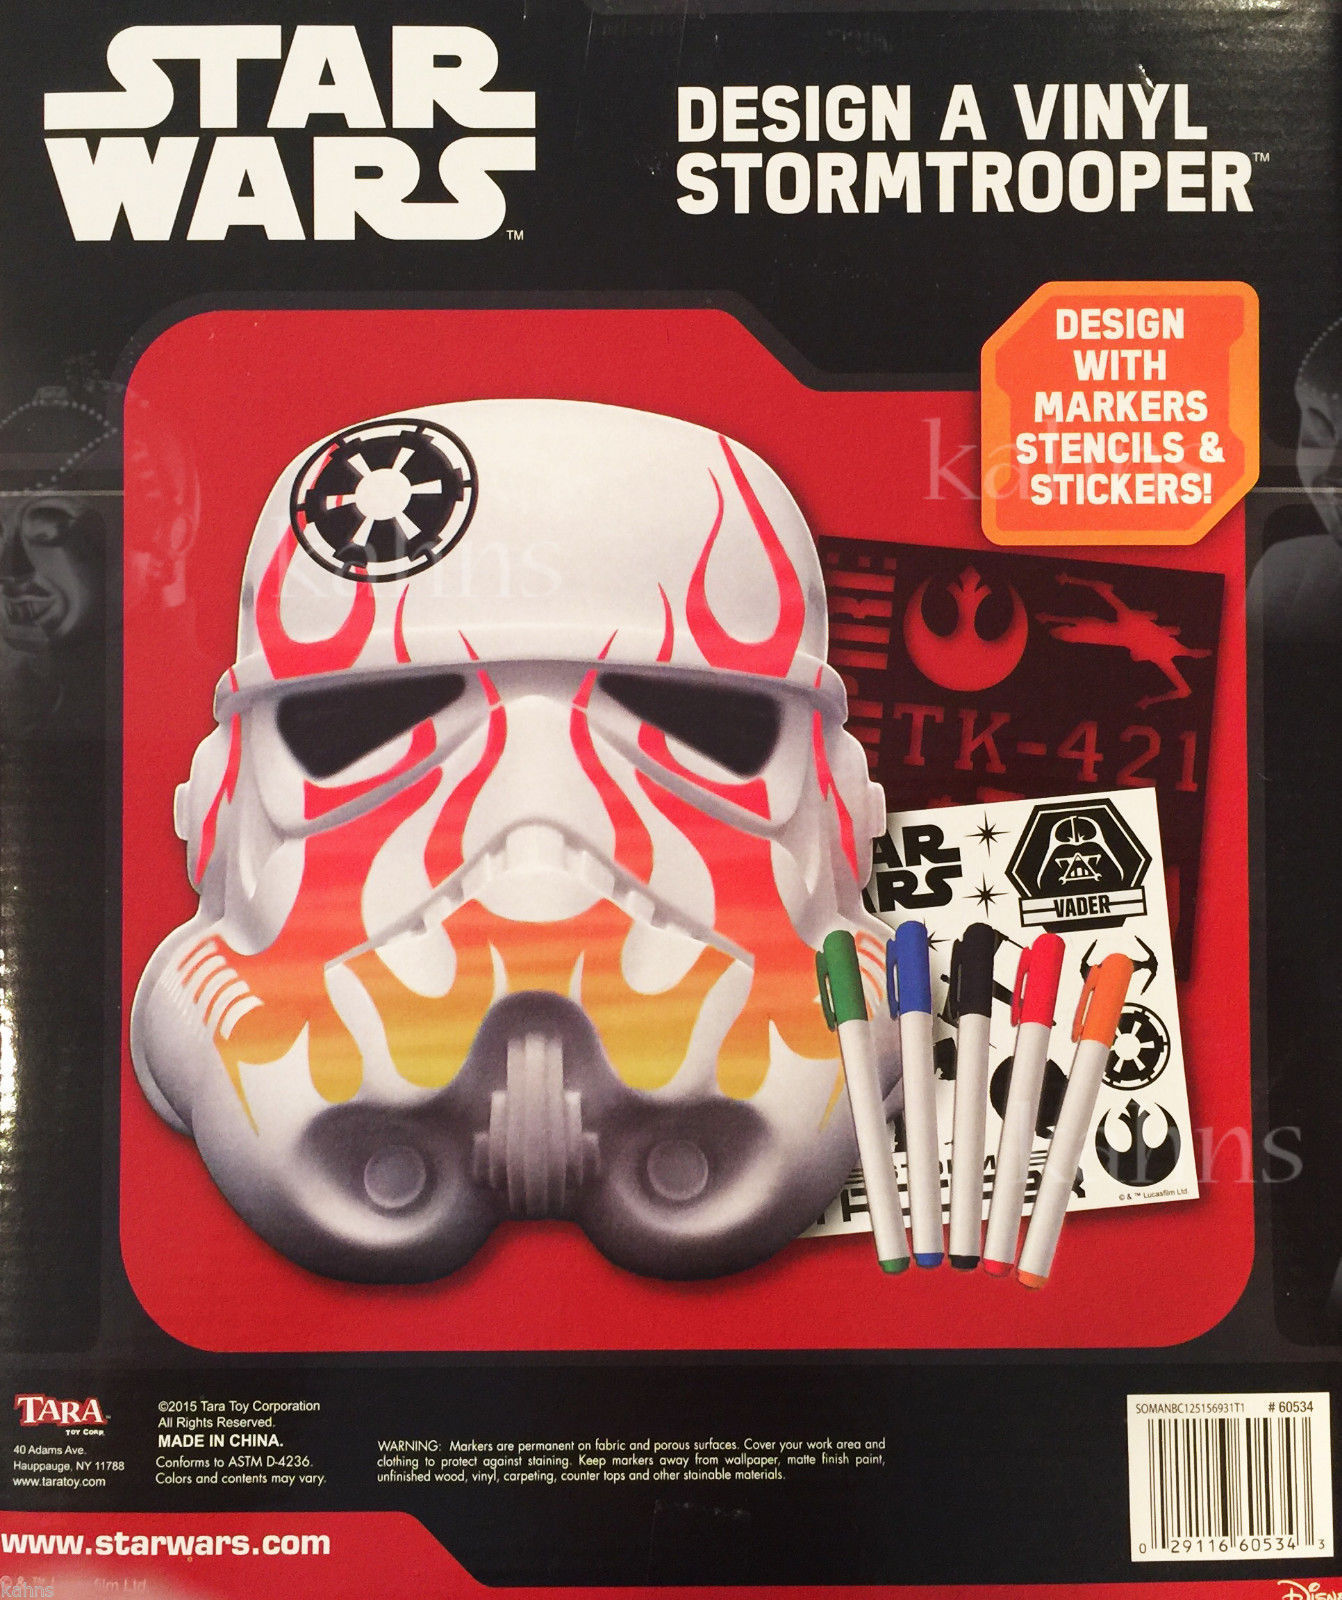 Star Wars Design A Vinyl Stormtrooper Helmet And 50 Similar Items